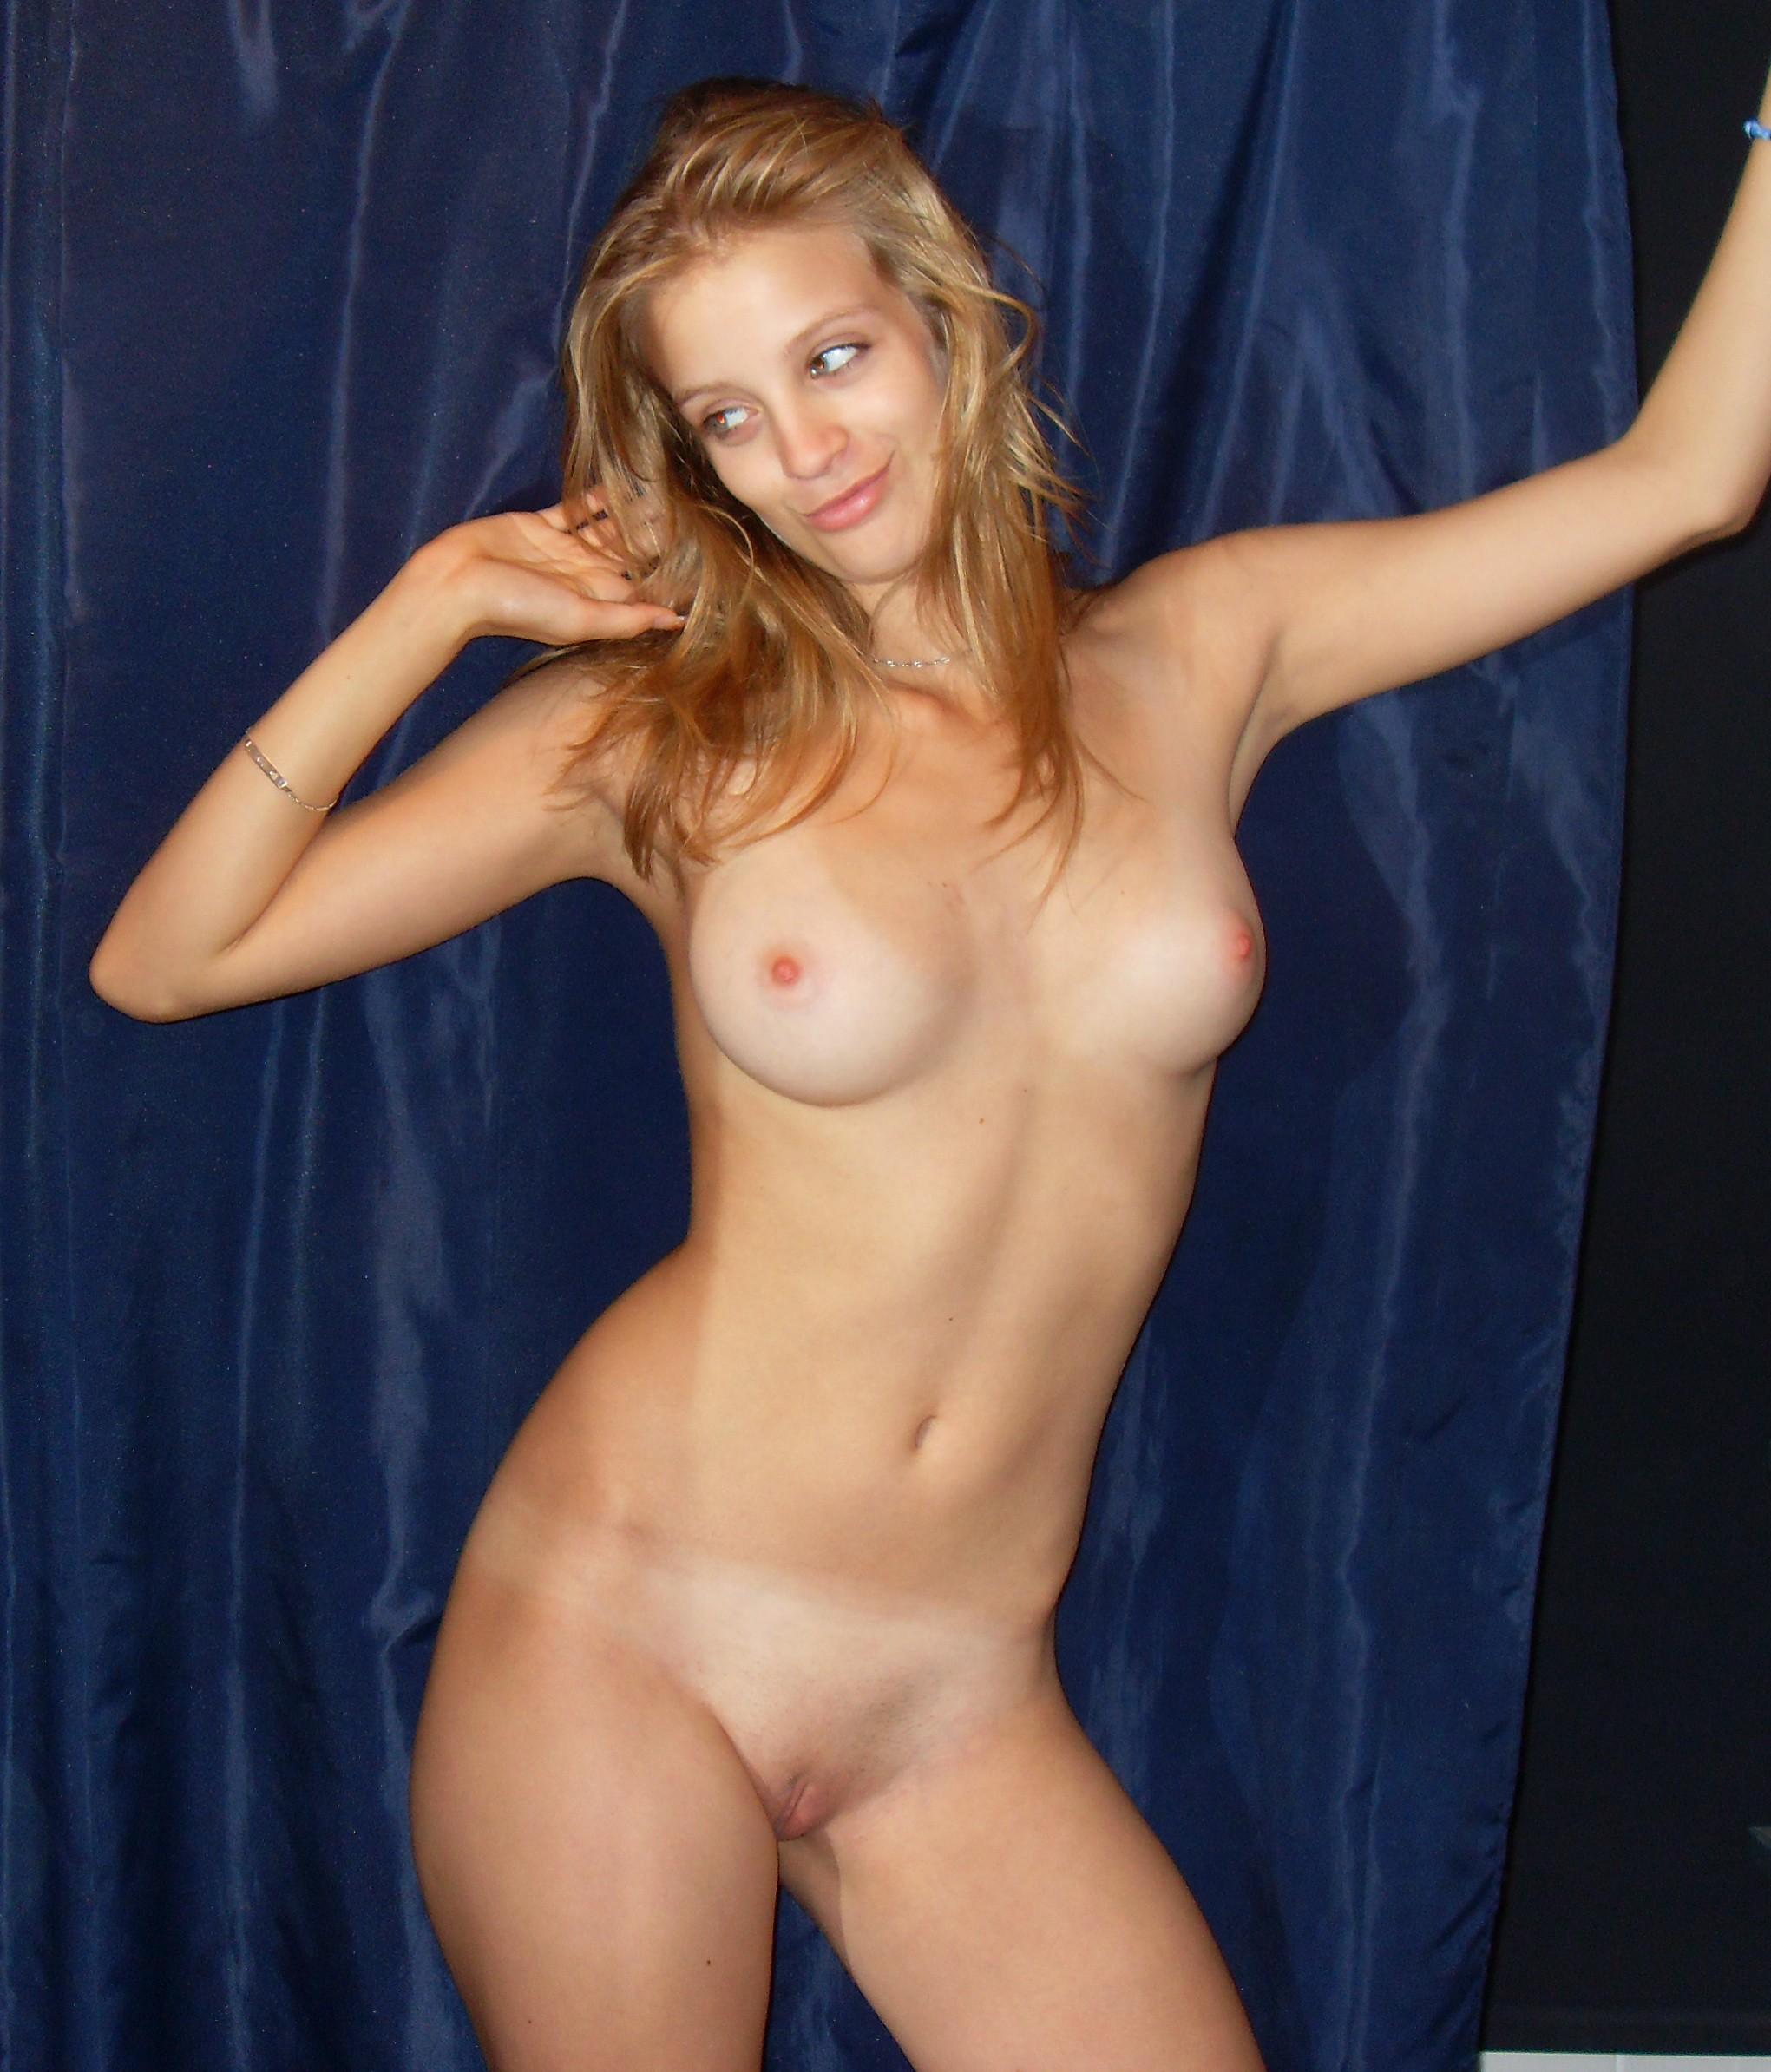 first latvian fusker www.sextingpics/wp-content/uploads/2009/09/